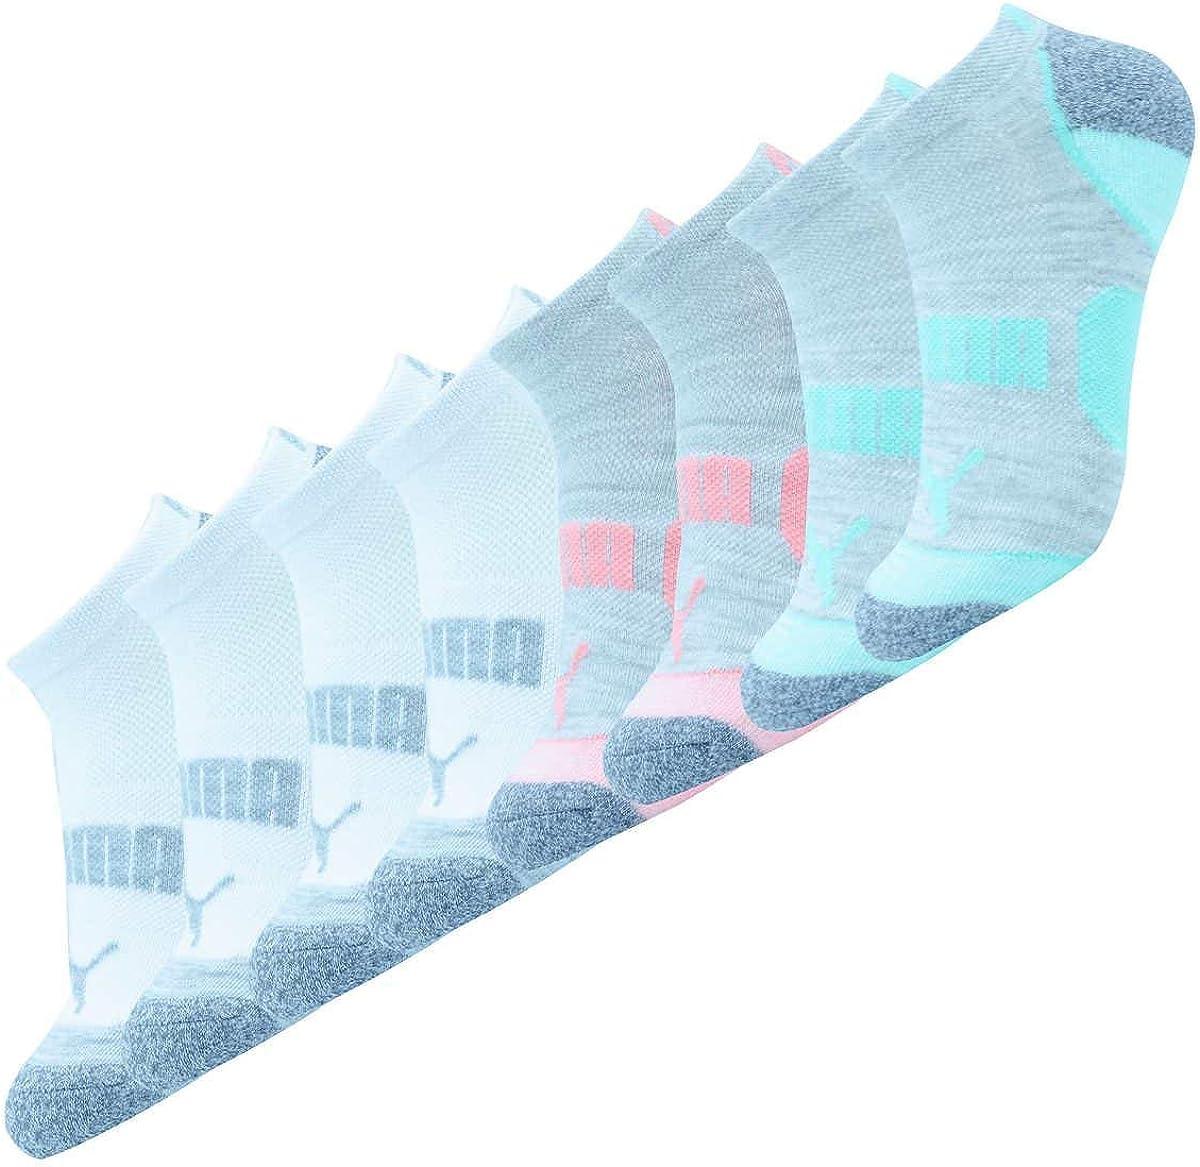 PUMA Women's 6 Pack No Show Multi Seasonal Wrap Introduction Sport All Socks 9-11 NEW before selling